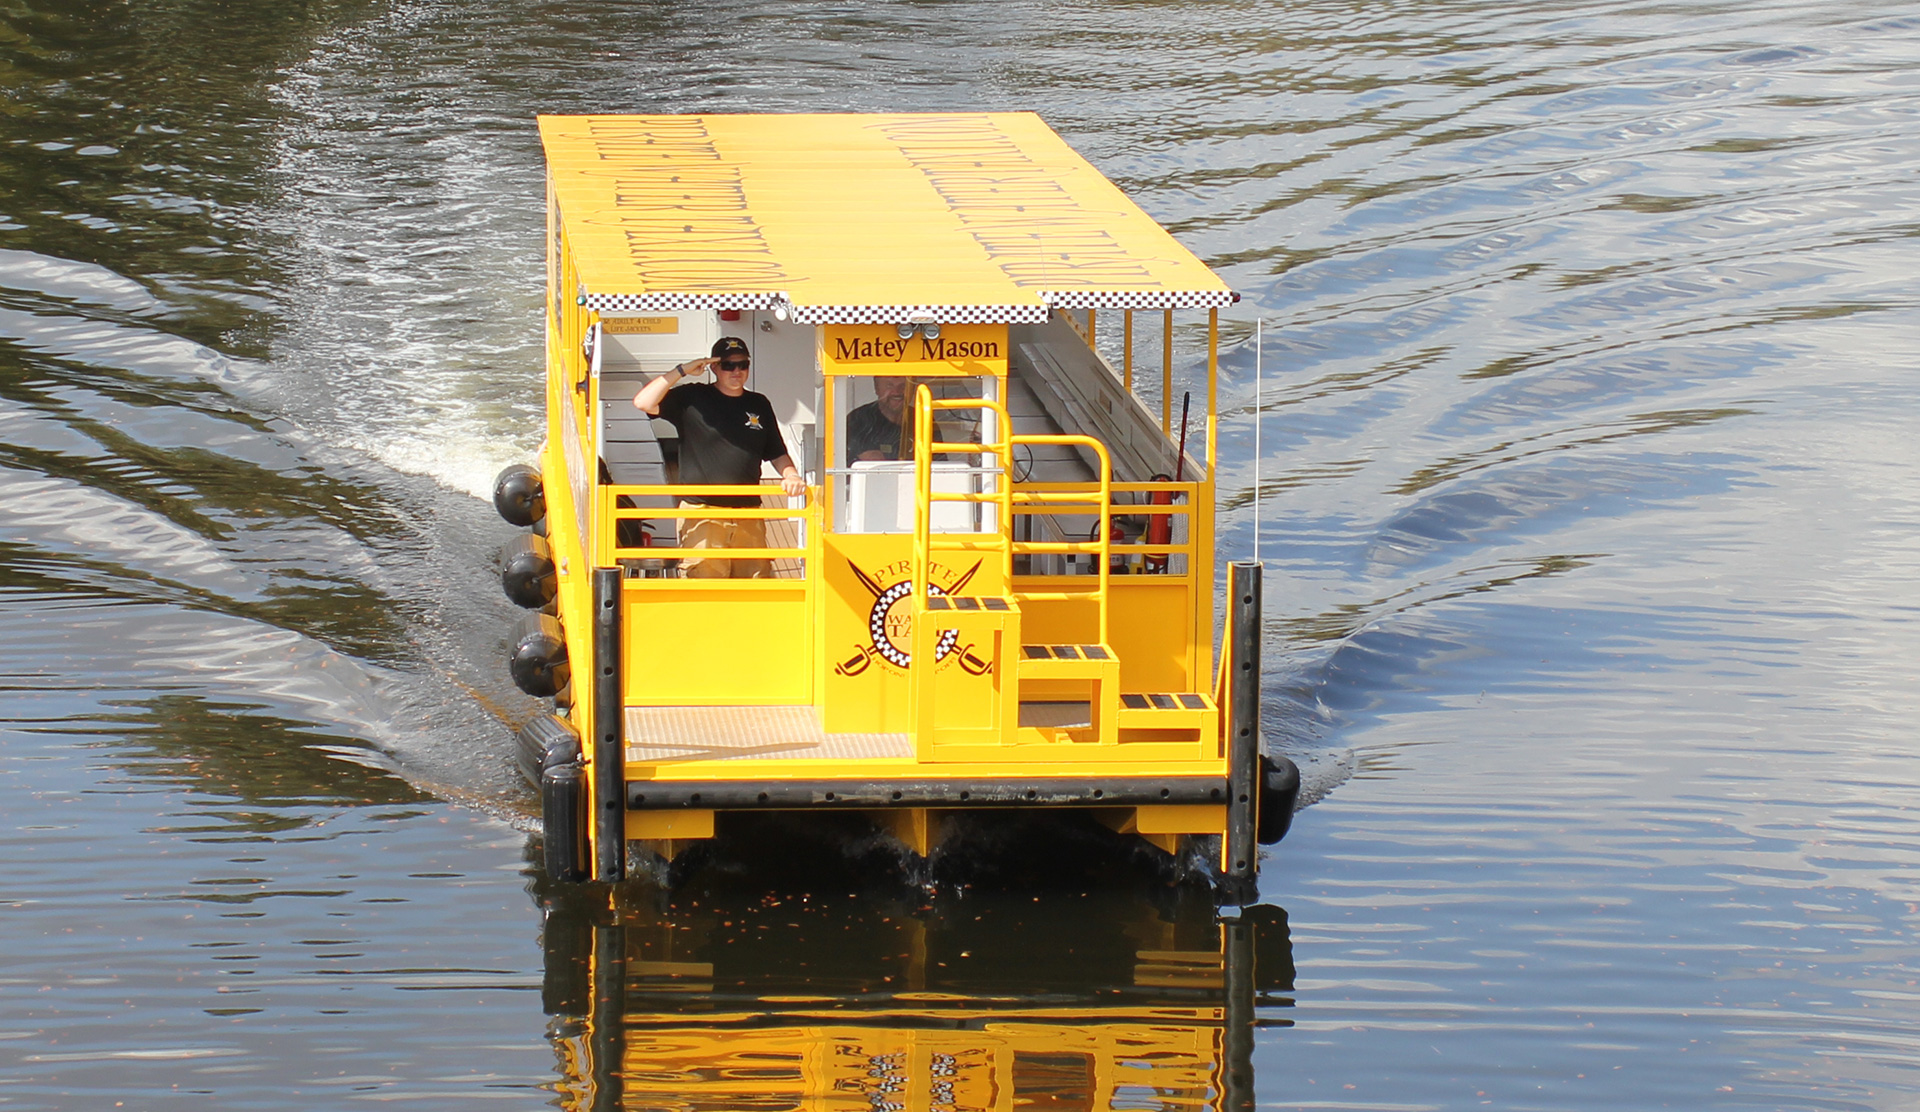 Matey Mason Water Taxi head on